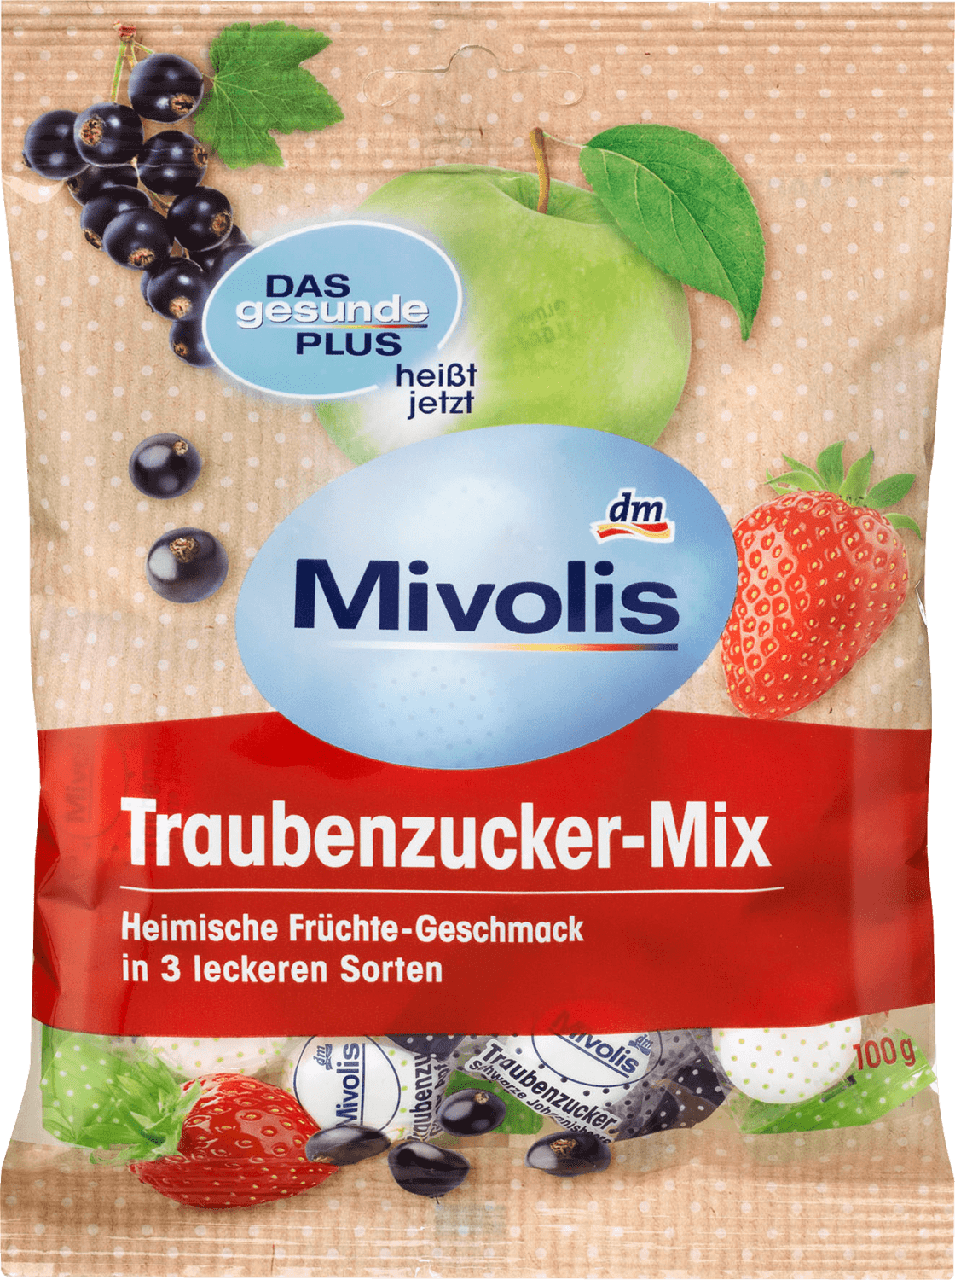 Декстрозные сладости без сахара Mivolis Traubenzucker-Mix, 100 гр.(37шт)